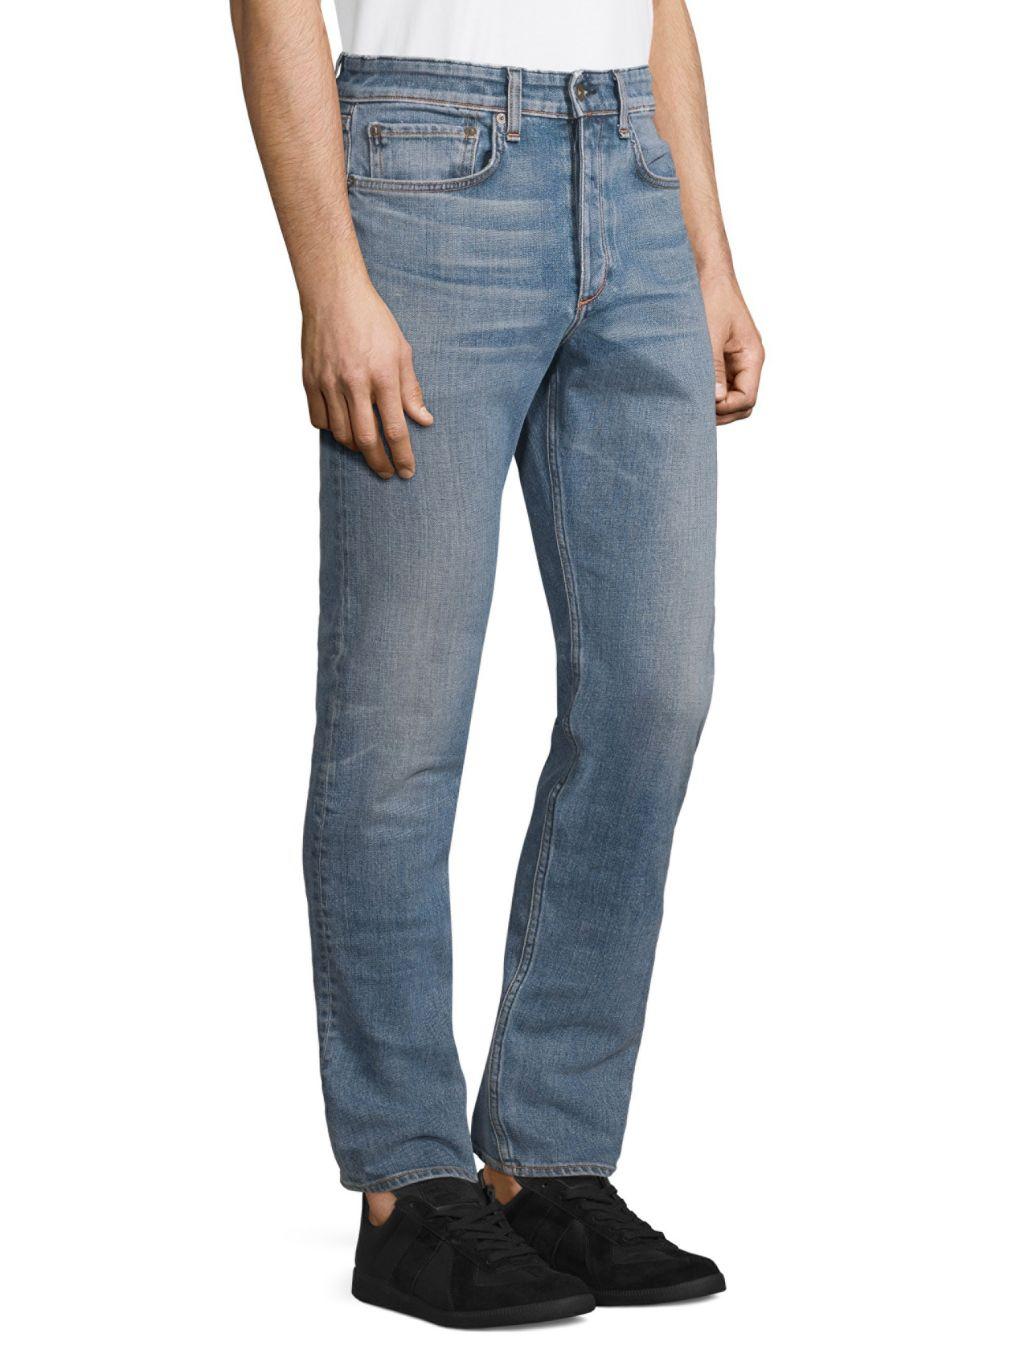 Rag & Bone Juno Fit-2 Jeans